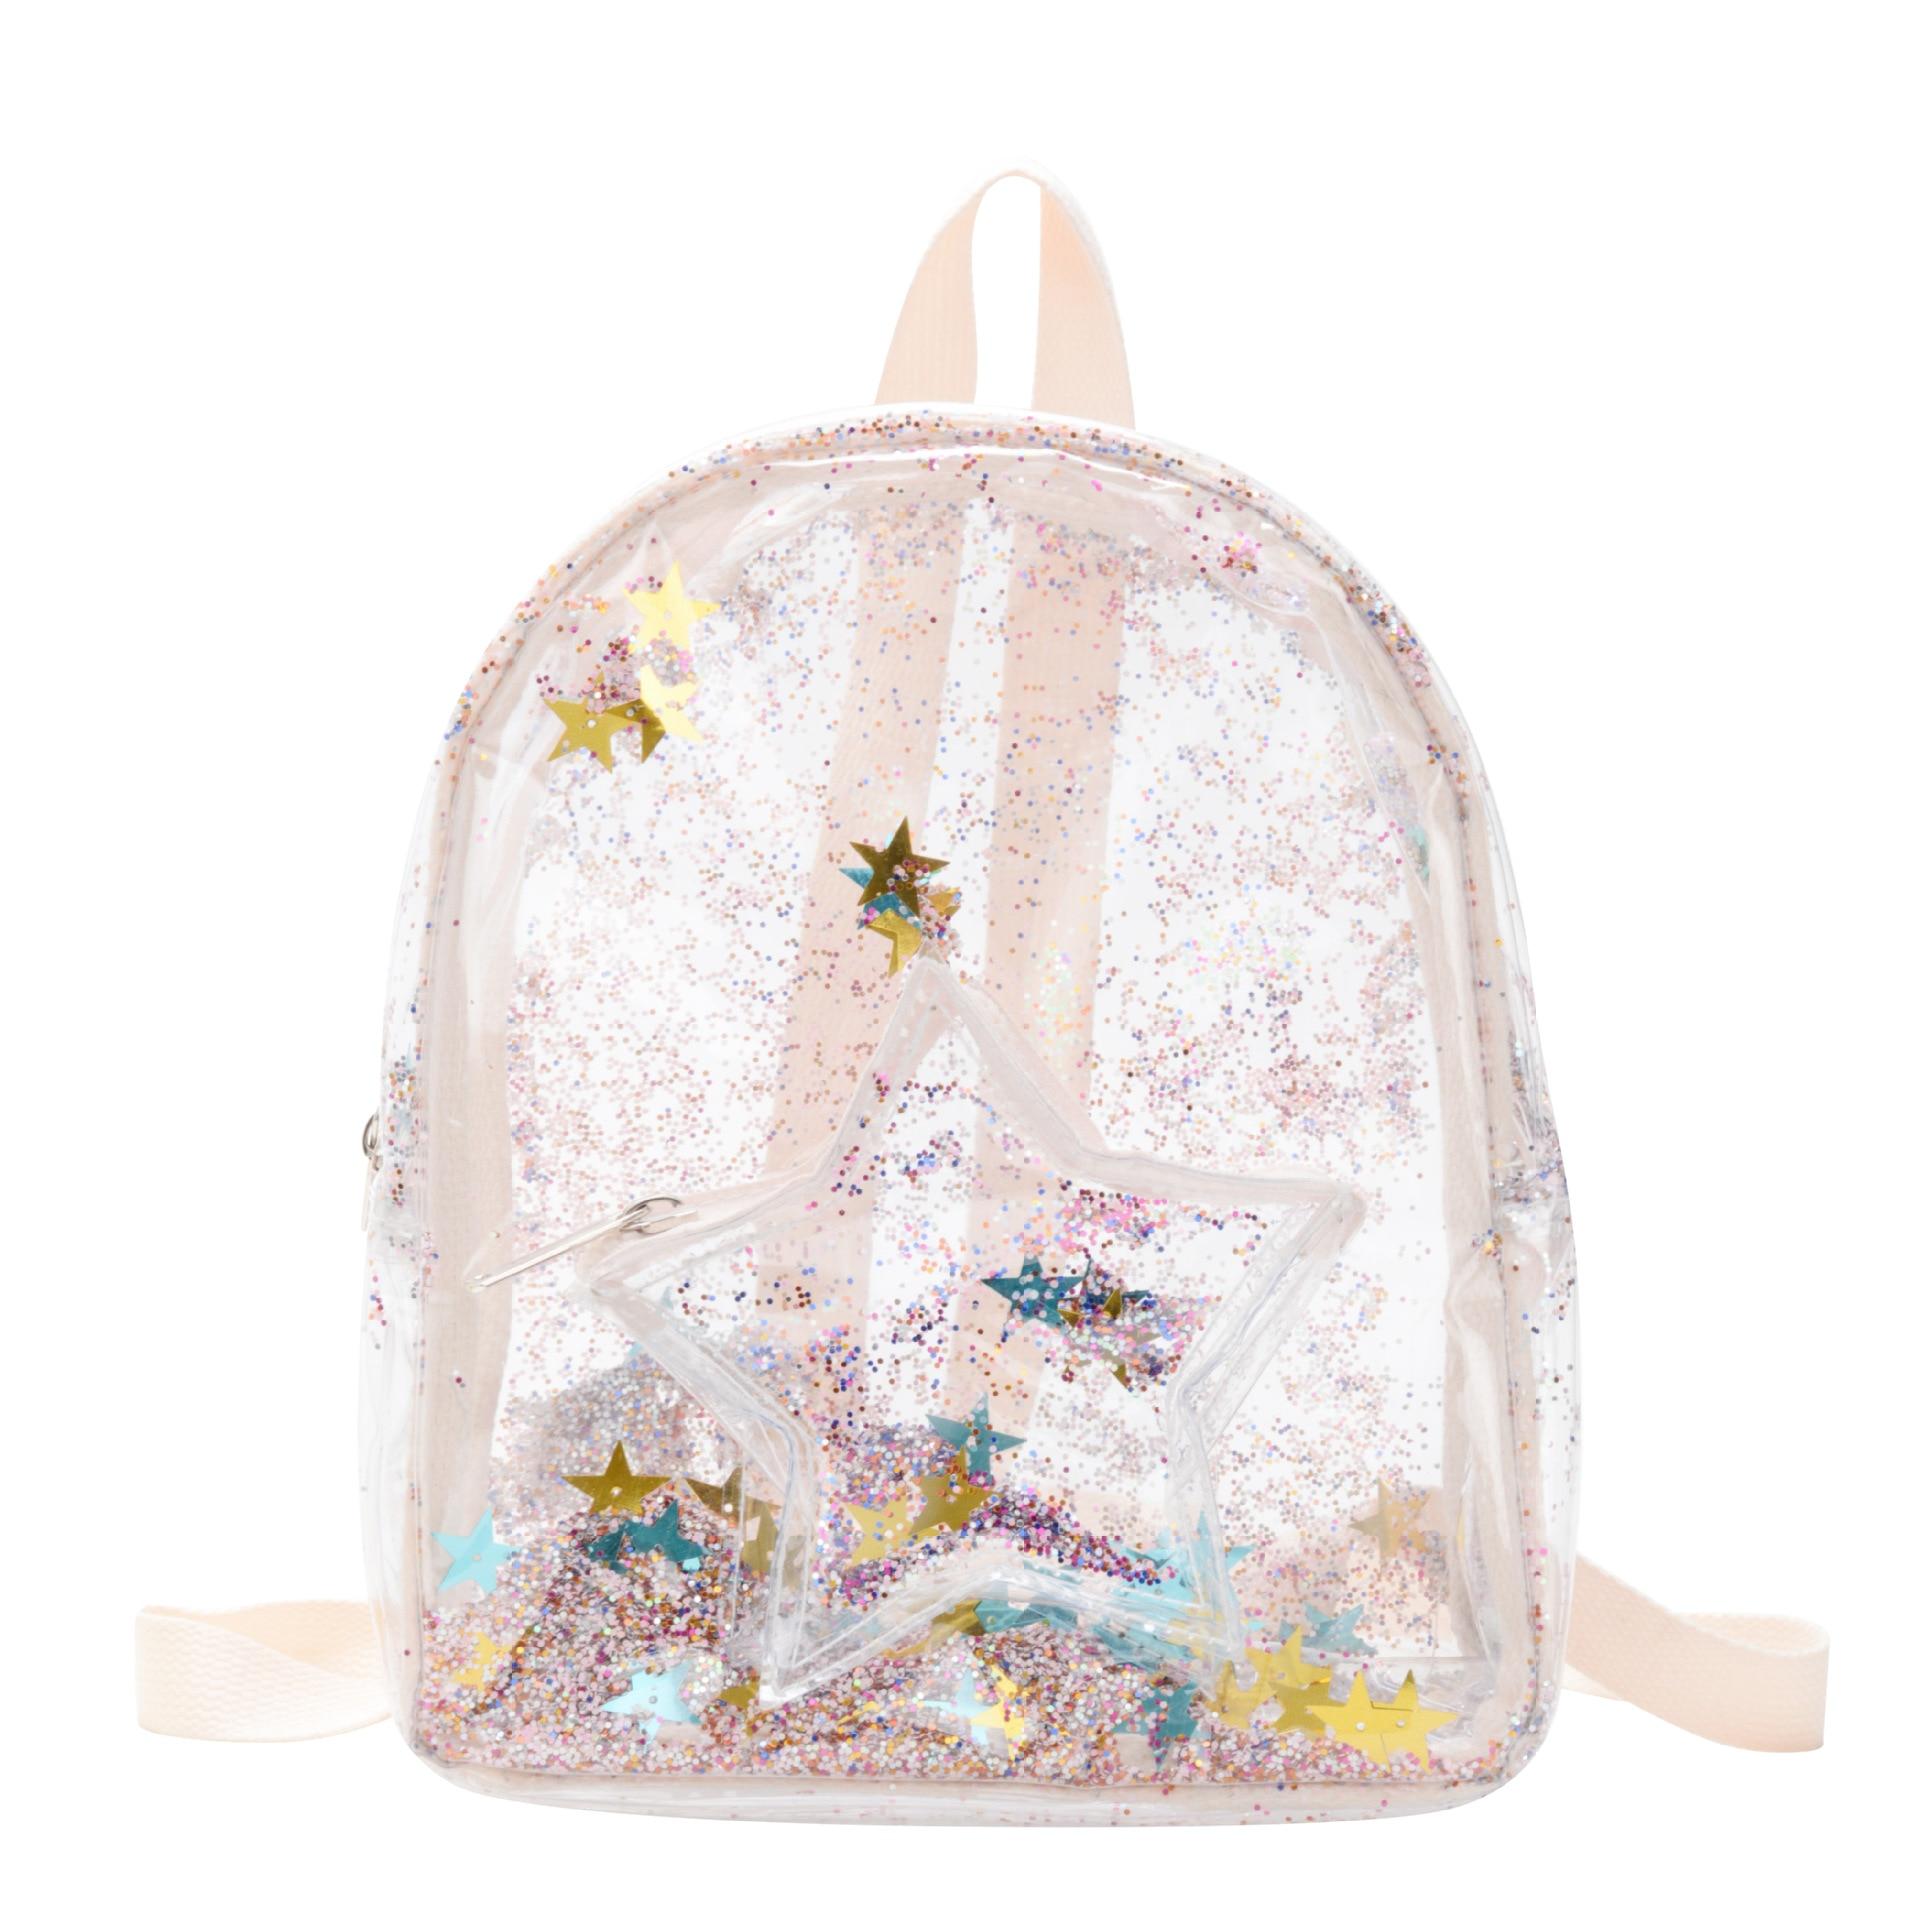 New 2020 Kids Mini Backpack Purse PVC Shinny School Bags For Girl Kawaii Transparent School Backpack Bag Baby Back Pack